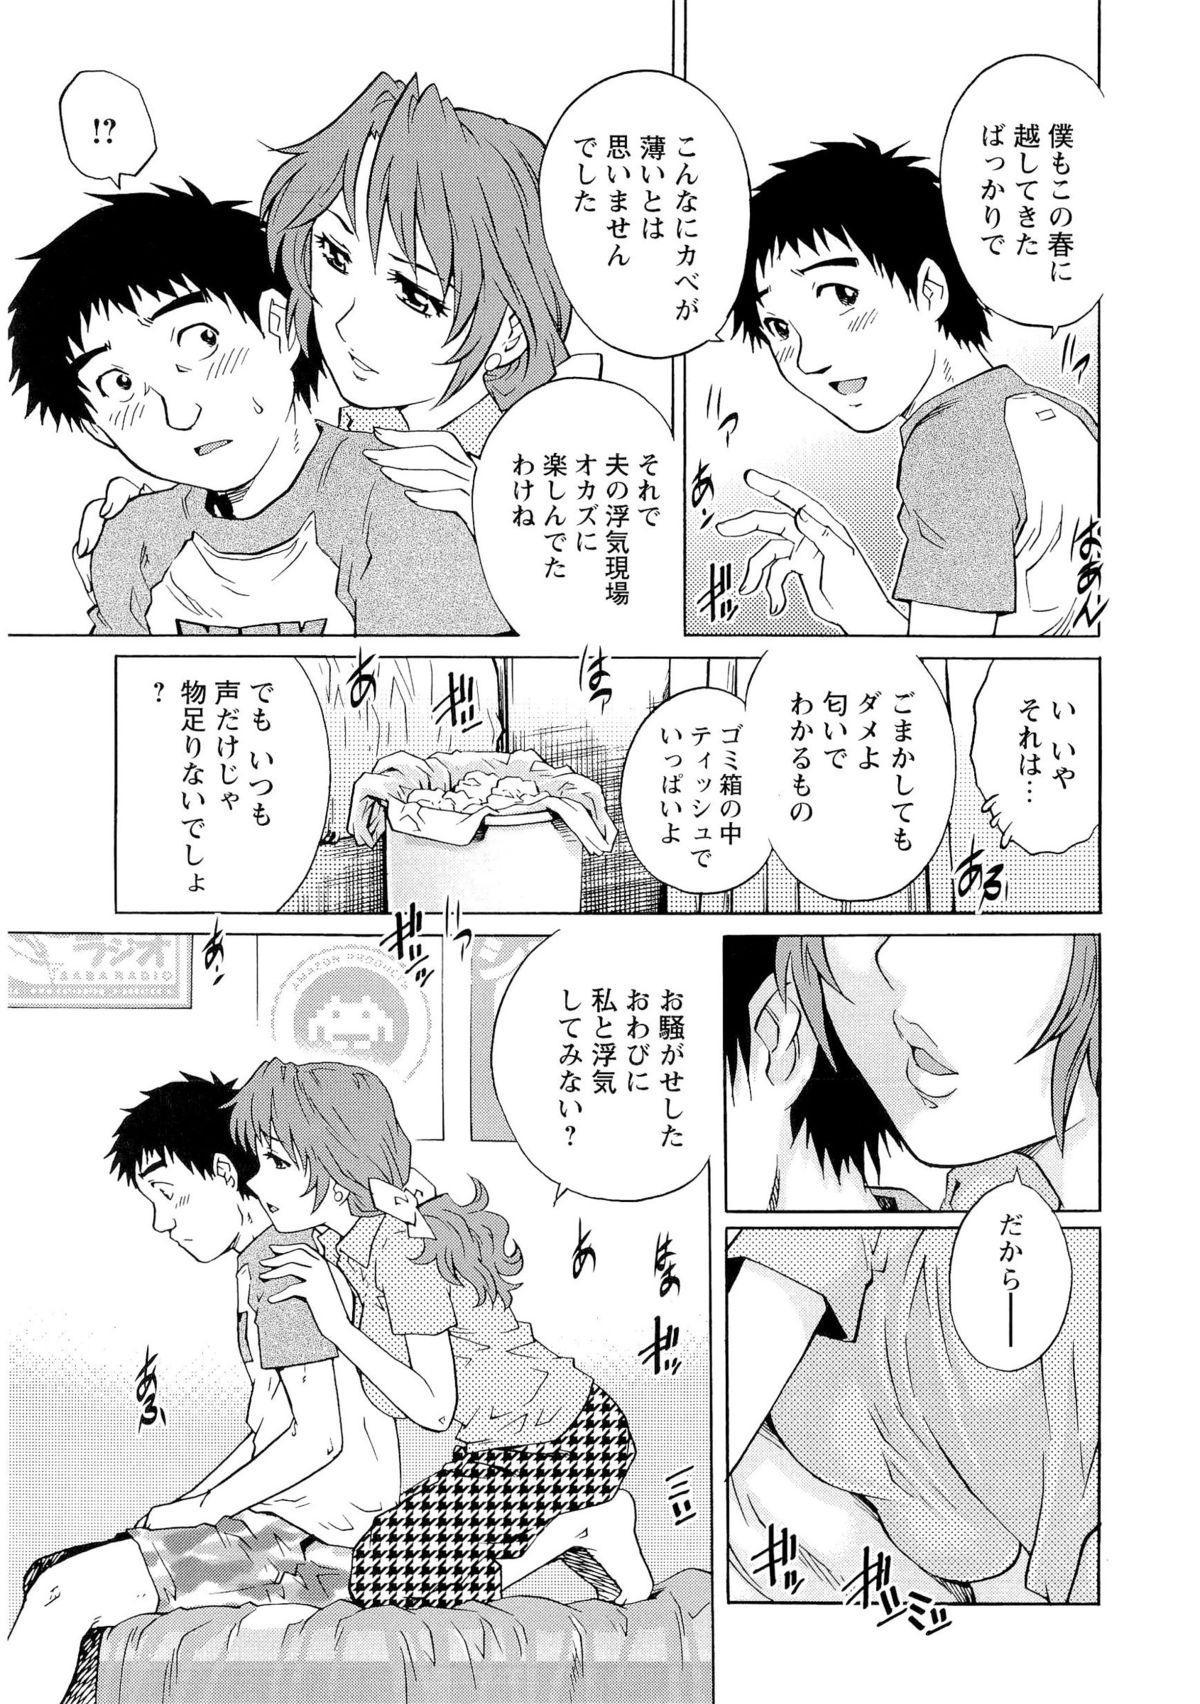 Nureteru Hitozuma - Wetly Wife 153